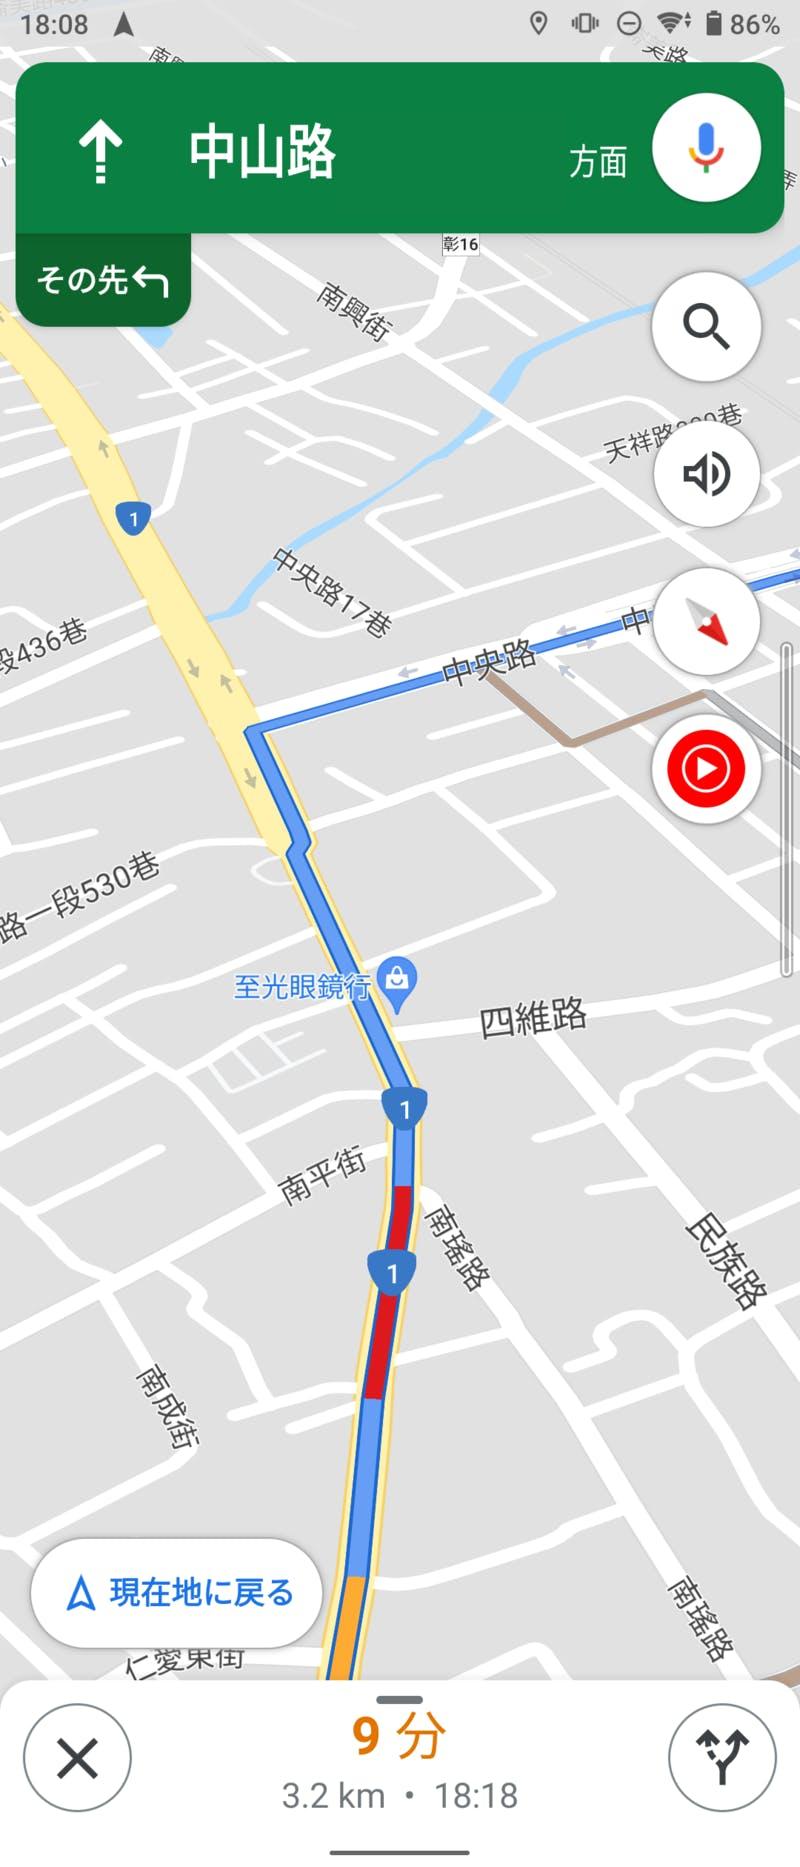 Android版Google マップにコンパスが再び表示されるように